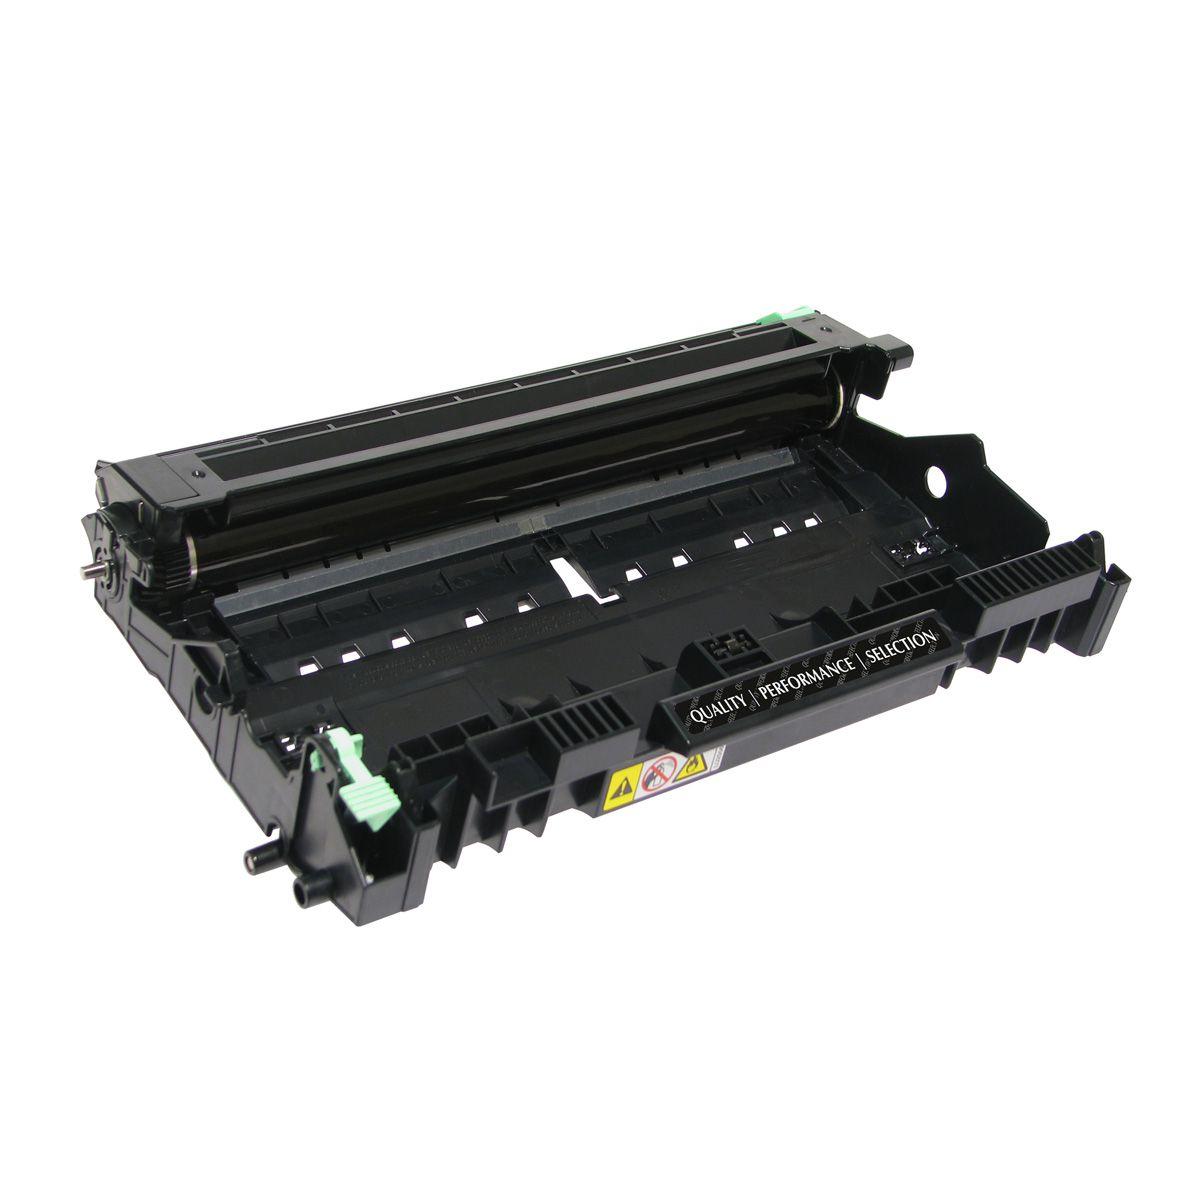 Fotocondutor DR360 DR-360 - DCP7040 2140 7440N 7040